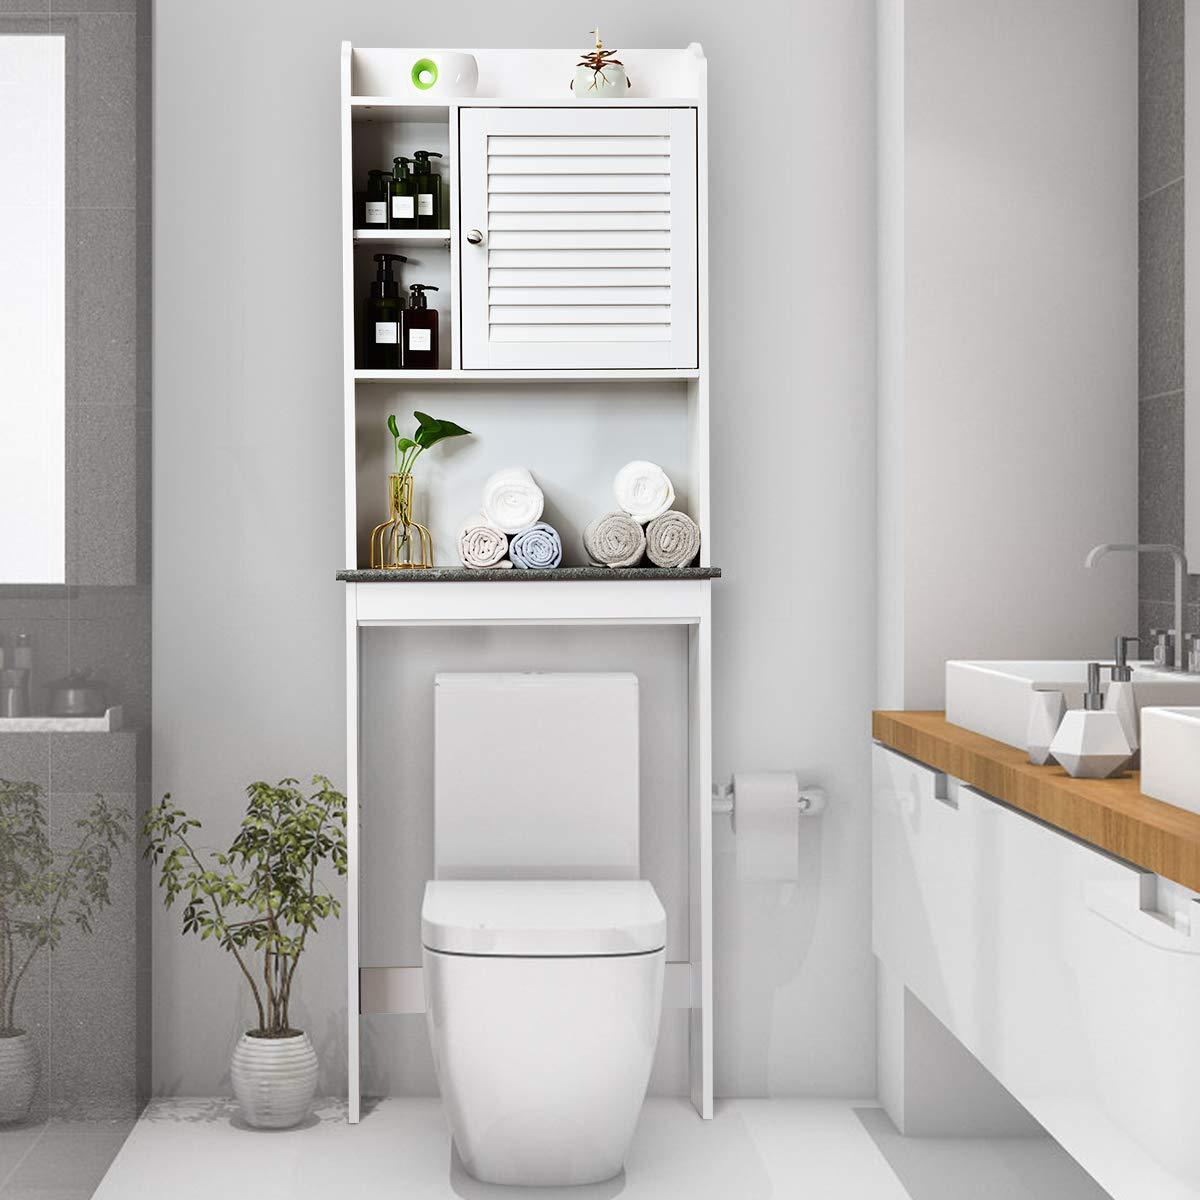 Giantex Over-The-Toilet Space Saver Collette Bathroom Spacesaver W/Storage Rack Cabinet Bathroom Organizer (68.5'' H) by Giantex